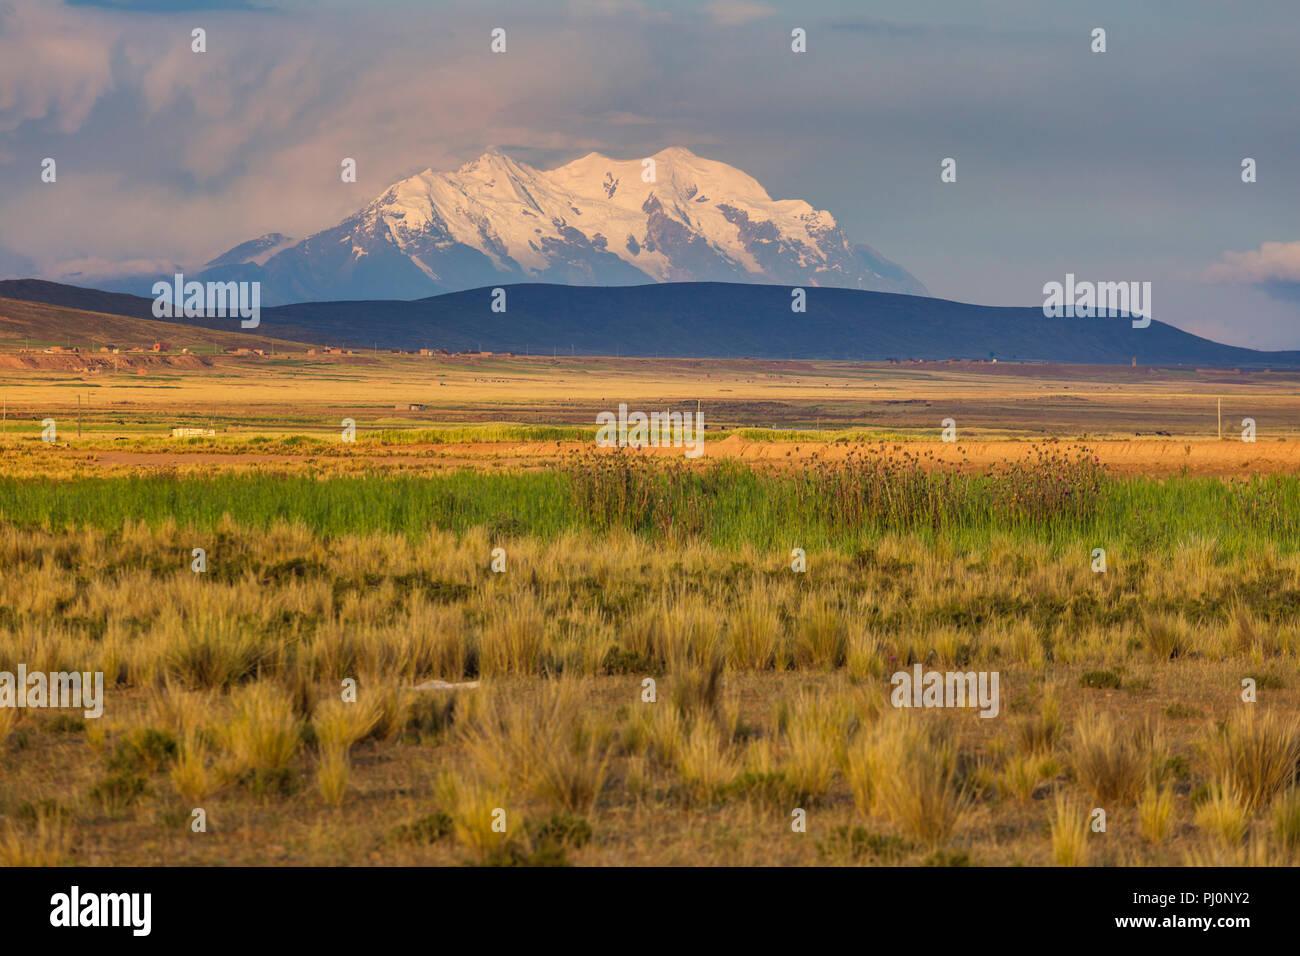 Illimani volcano, Aymara, Cordillera Real, La Paz department, Bolivia - Stock Image